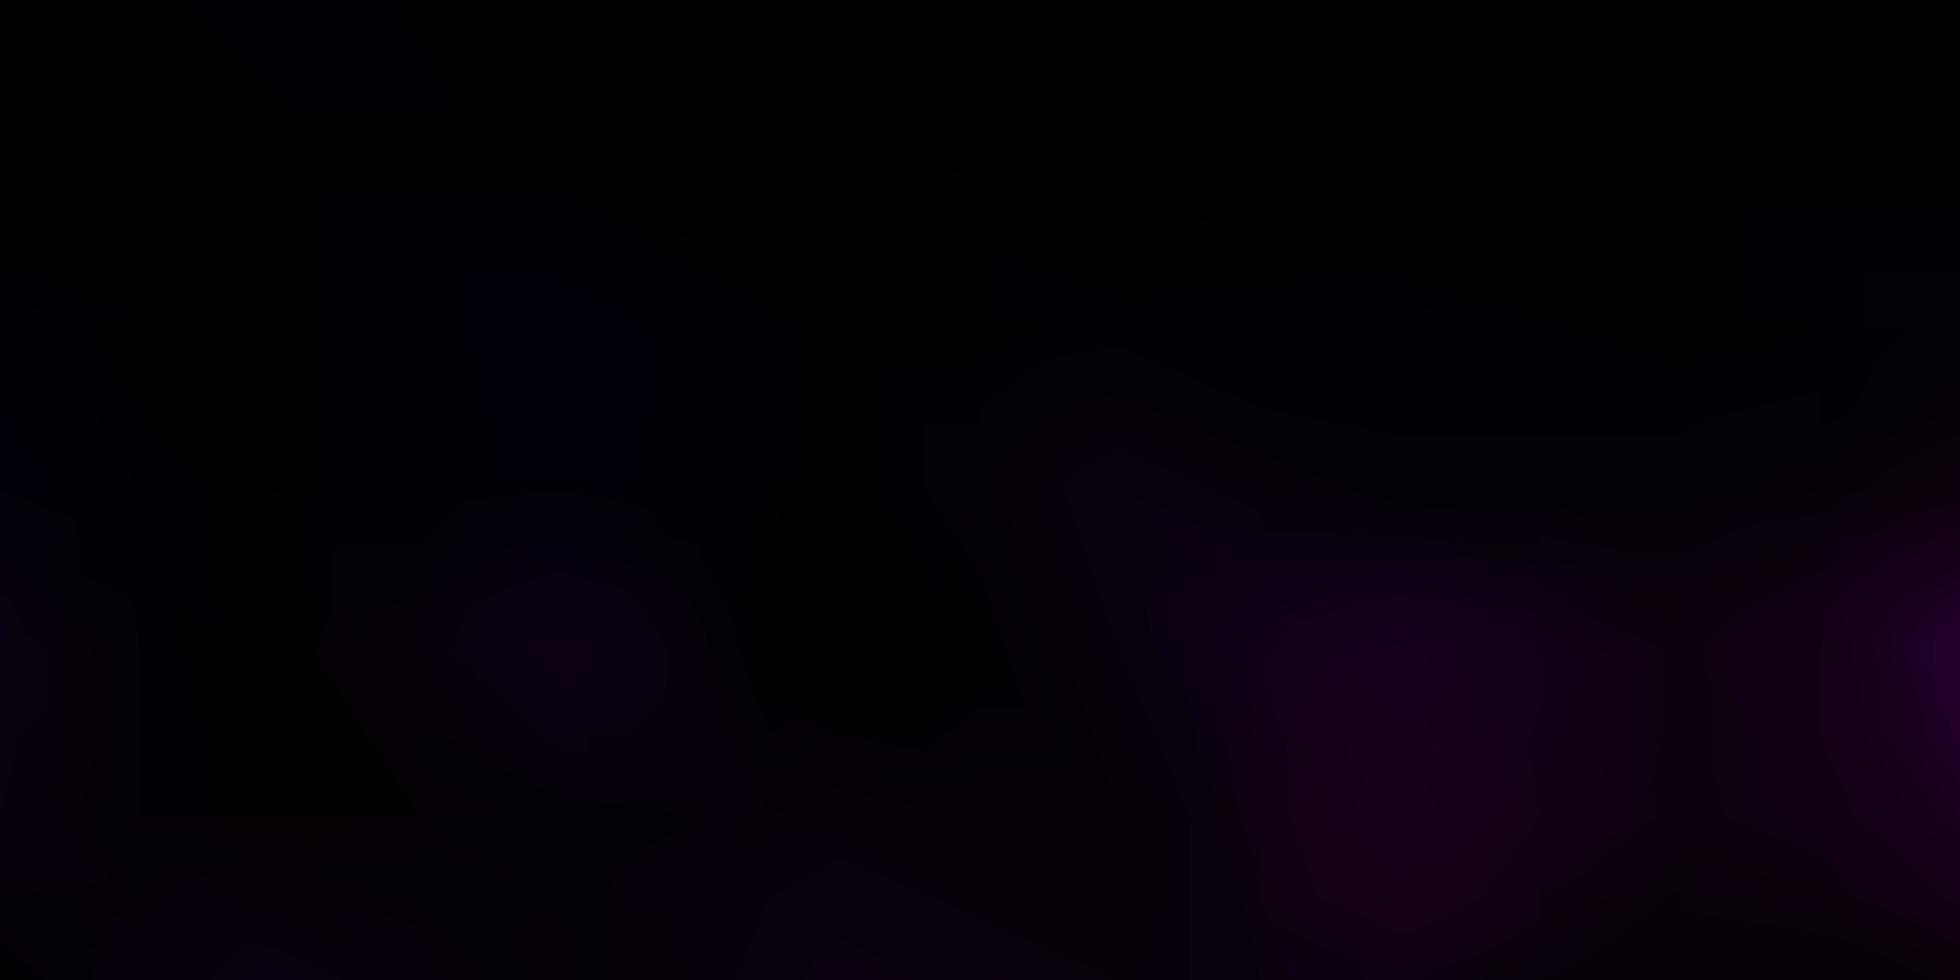 fundo de borrão de vetor rosa escuro e azul.